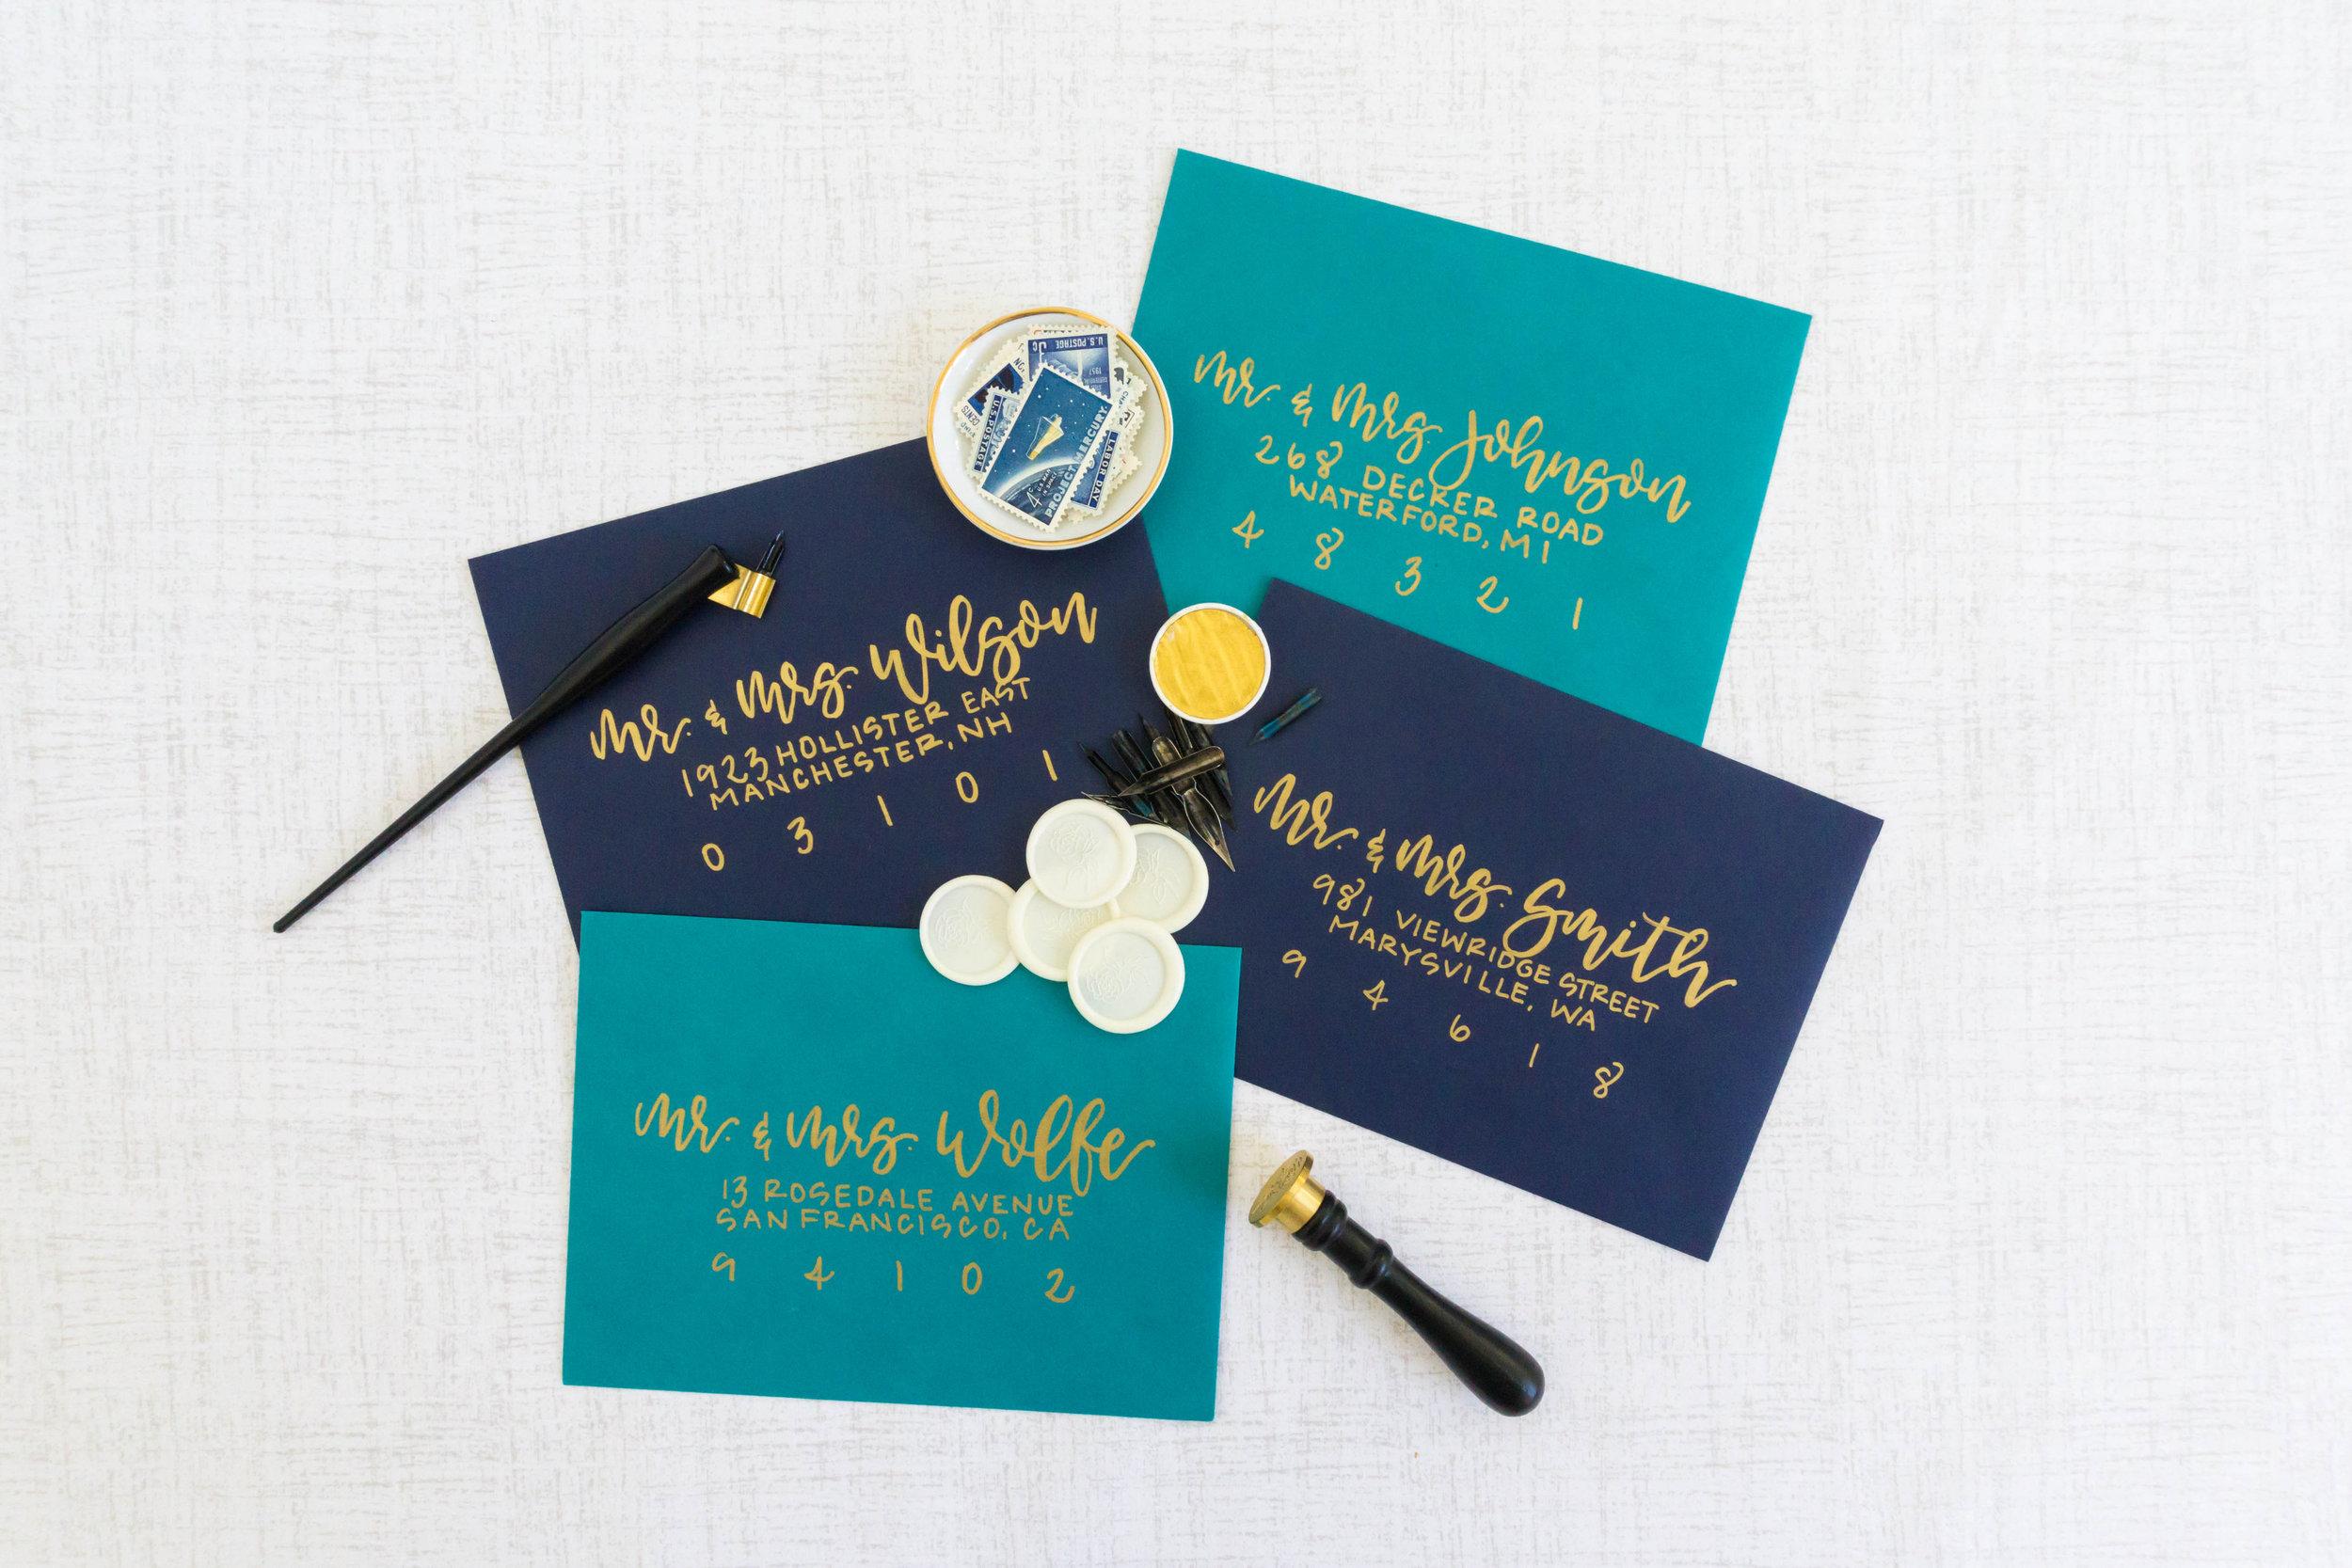 love-fern-design-studio-custom-wedding-invitations-for-the-modern-couple-modern-calligraphy-in-seattle-washington-custom-wedding-stationery-navy-gold-teal-envelopes